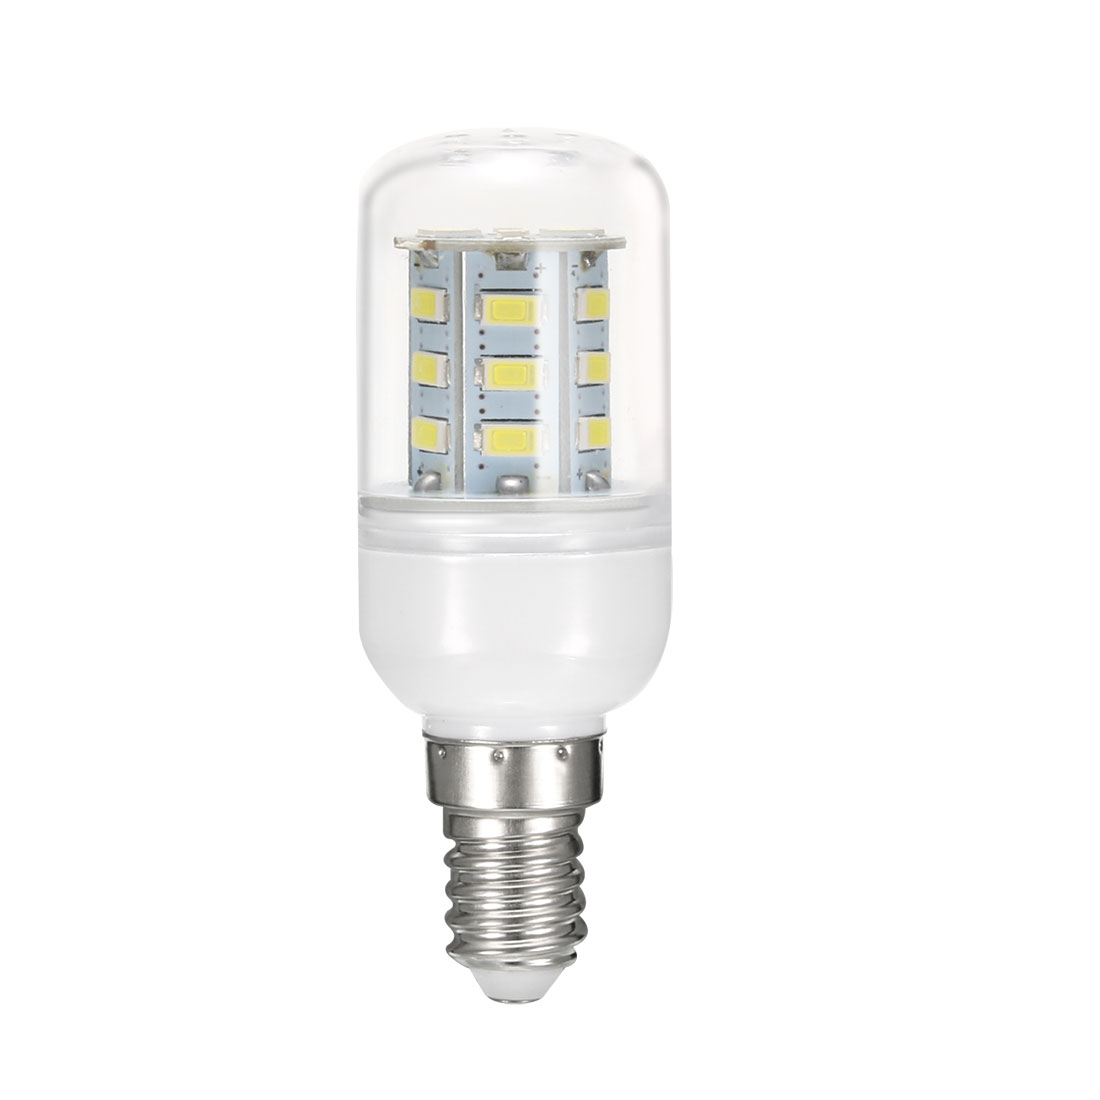 AC 220-240V 2.6W E14 Screw Base 96 LEDs 5730 Pure White 6000K LED